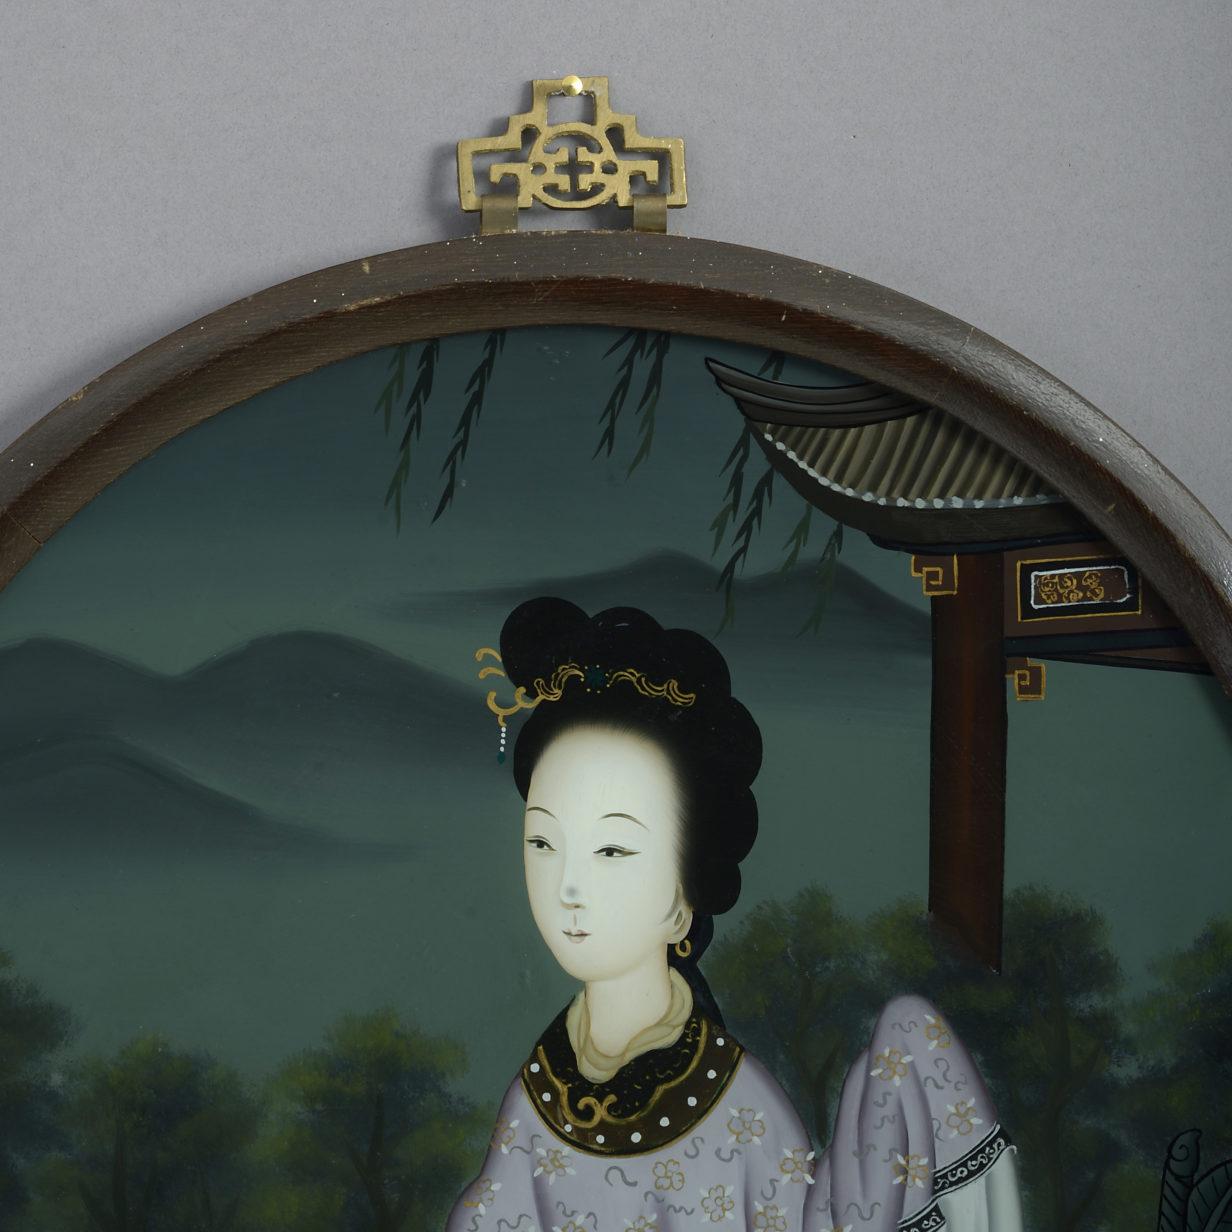 Circular Reverse Glass Portrait